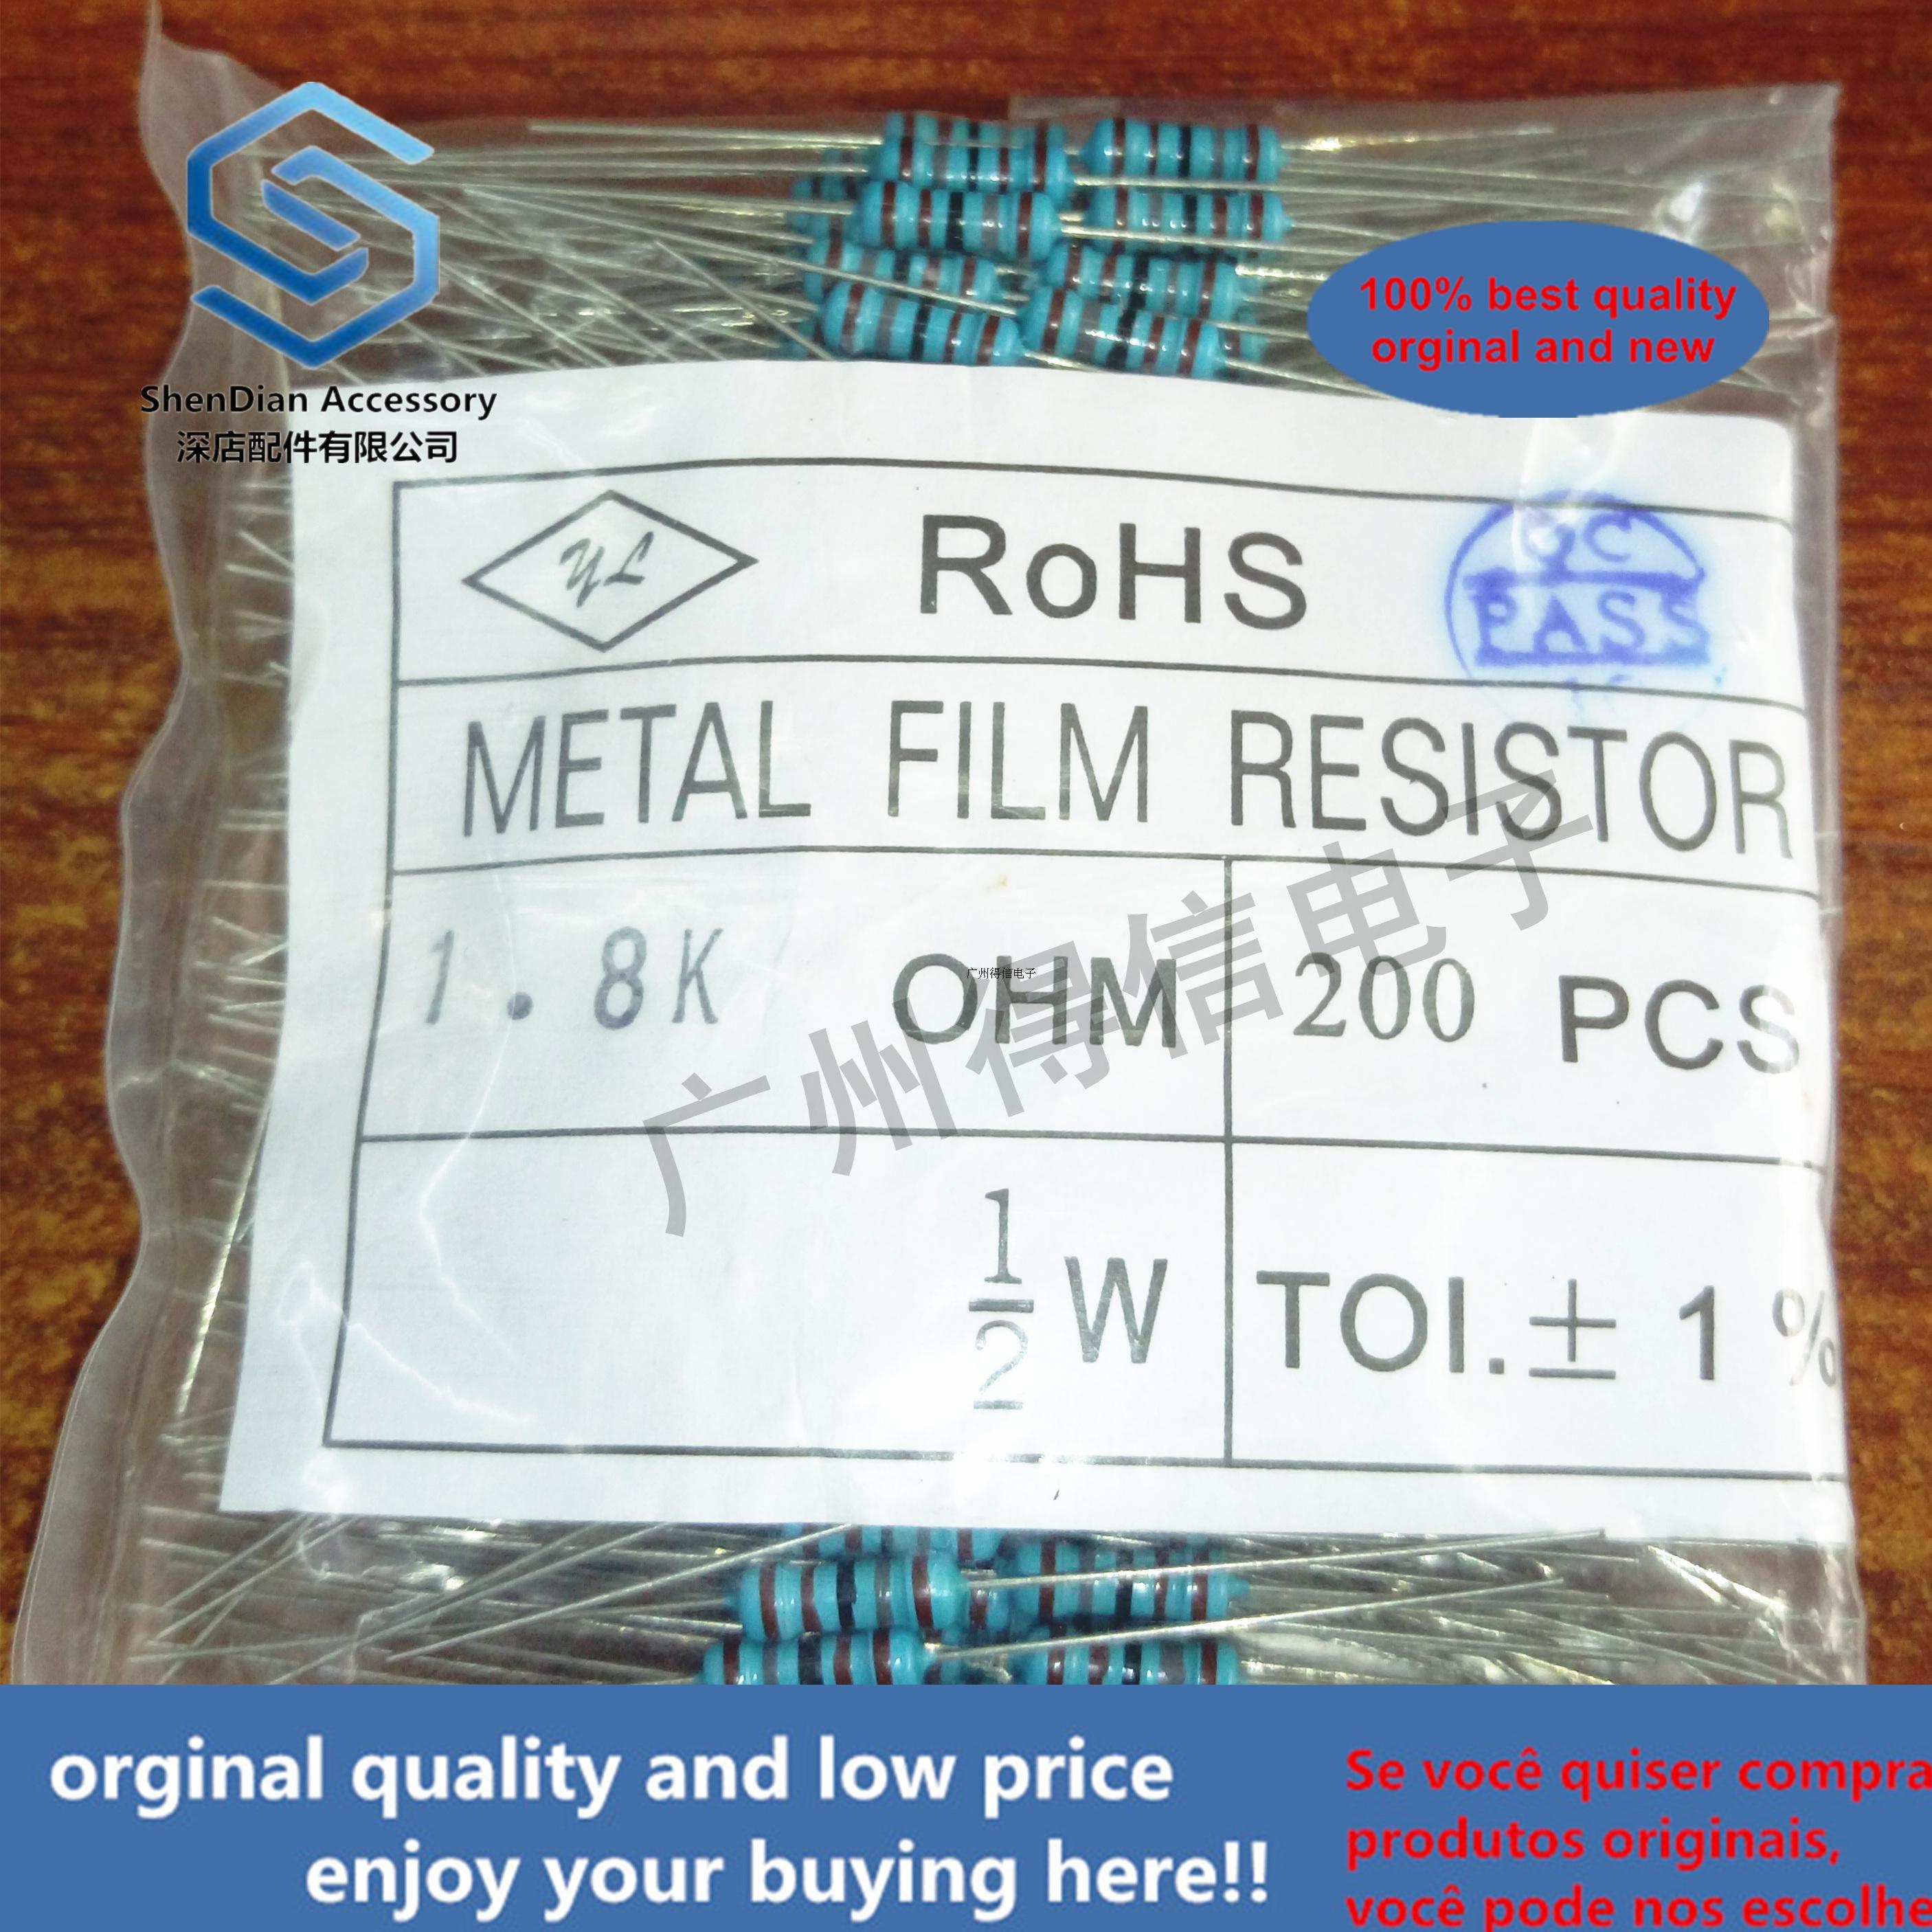 200pcs 1 / 2W 1.8K 1800 Euro 1% Brand New Metal Film Iron Feet Resistance Bag 200 Pcs Per Pack